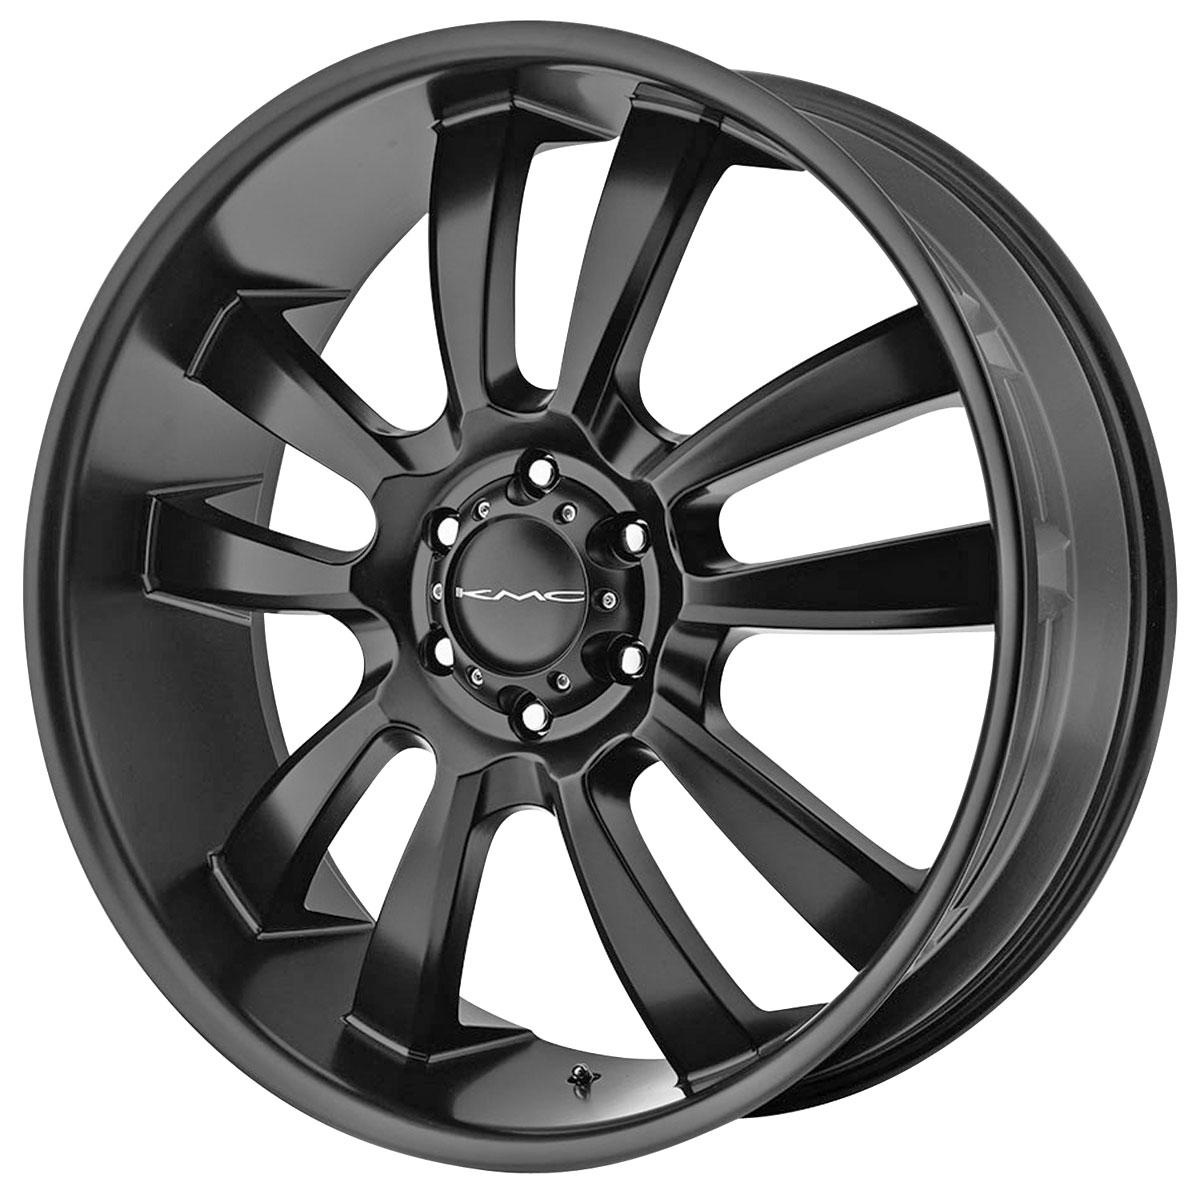 Wheel, KMC, KM673 SKITCH, 1999-2019 Escalade, 22X9